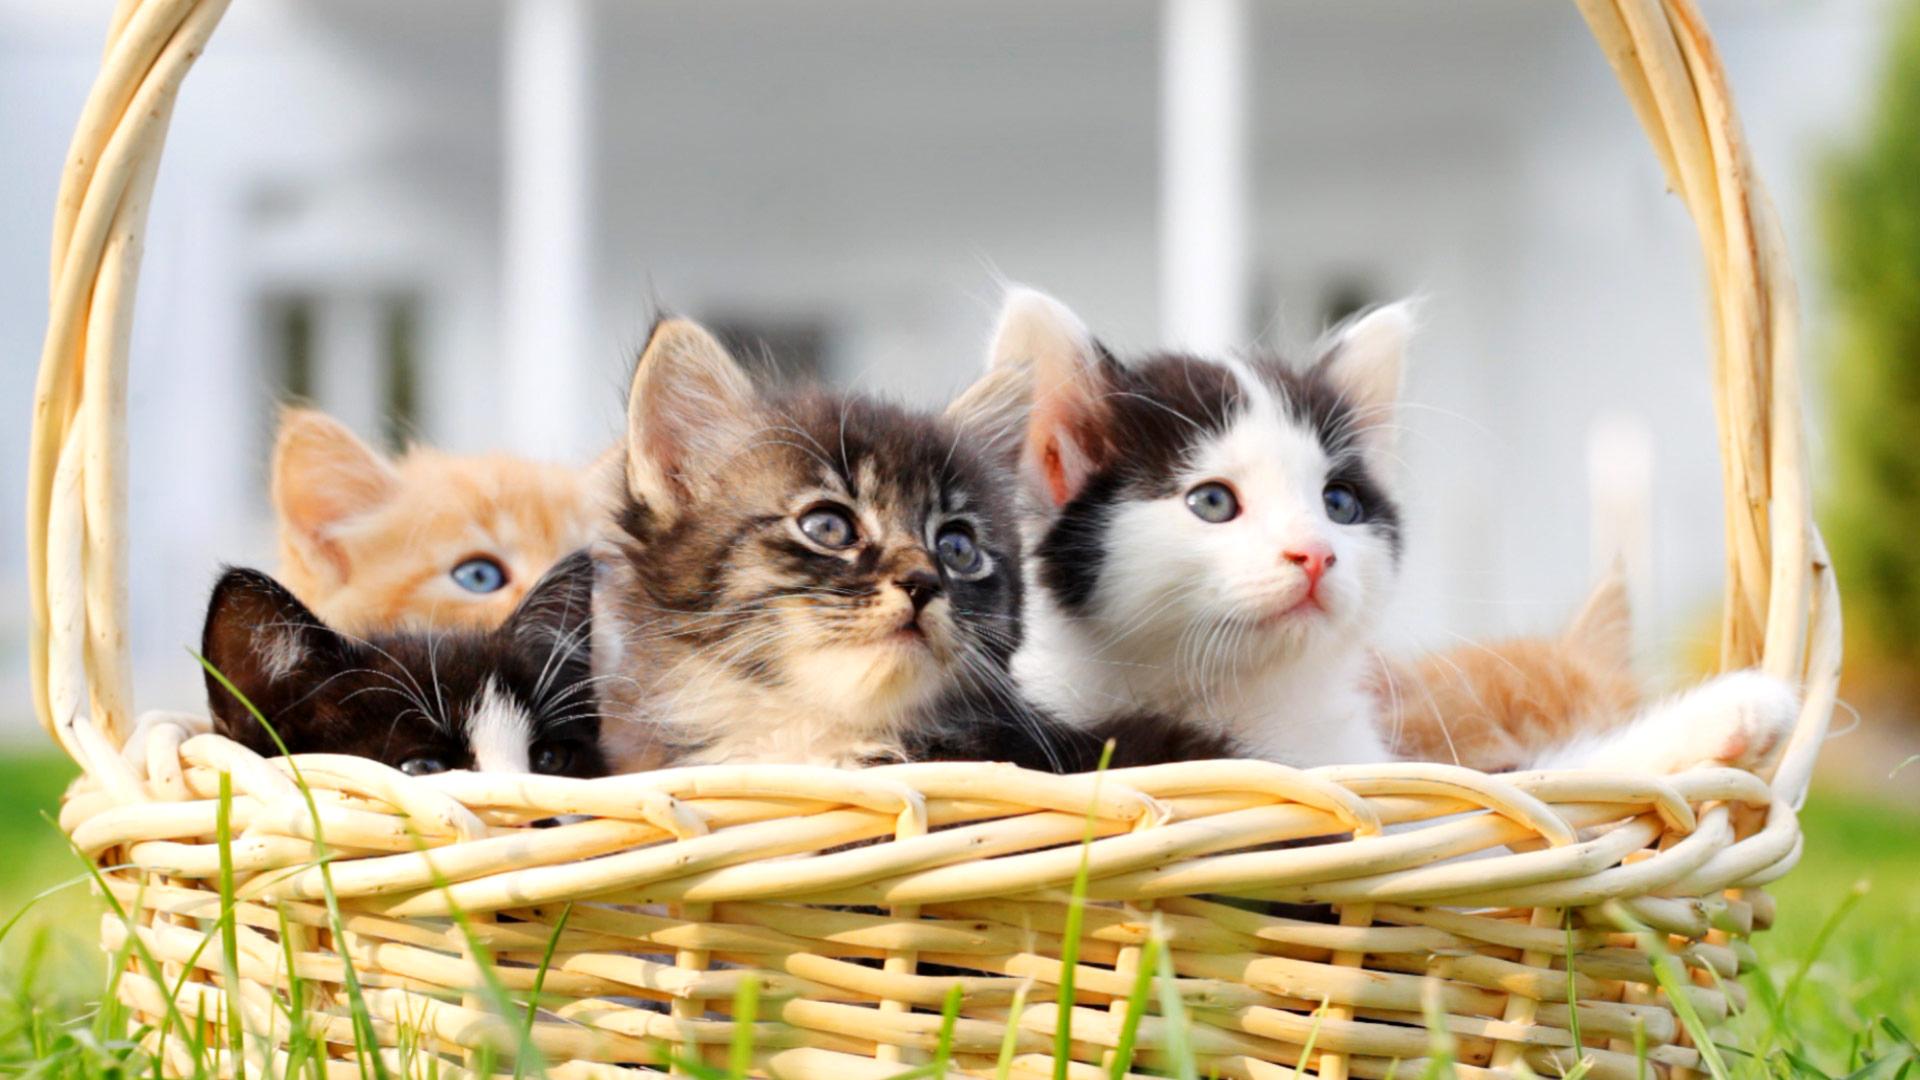 Открыток, картинки кошка с котенком в лукошке